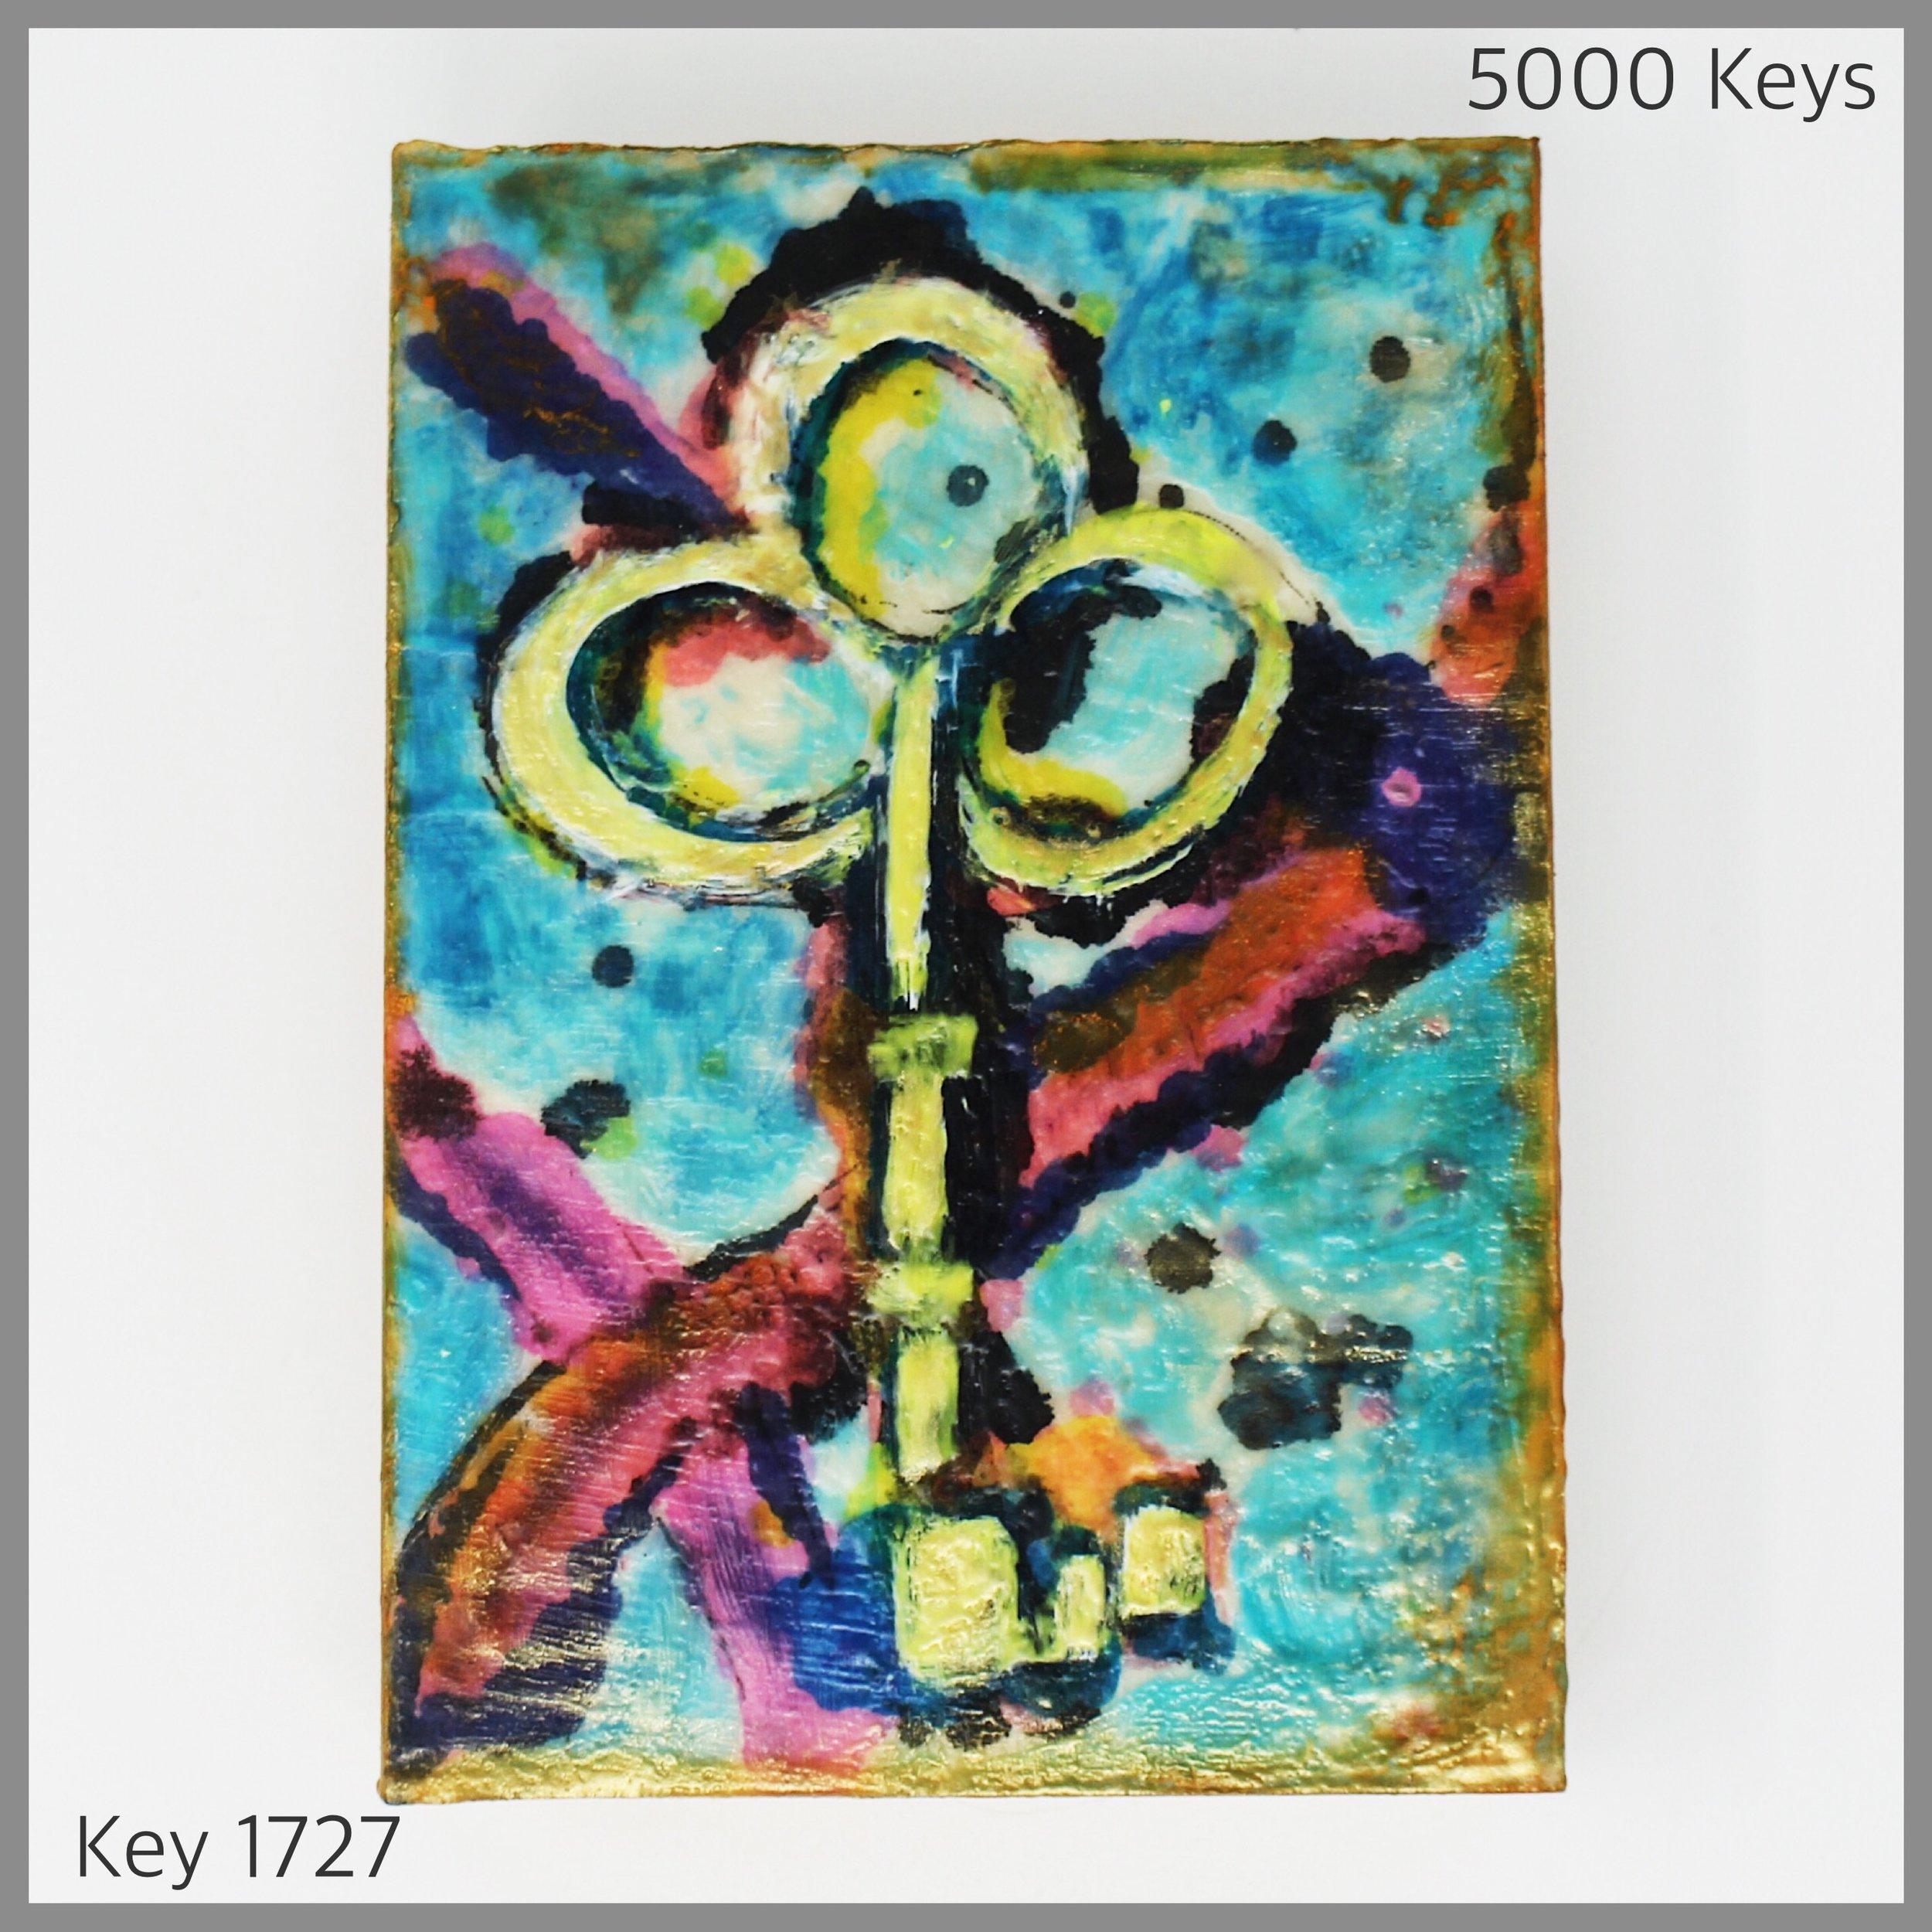 Key 1727 - 1.JPG